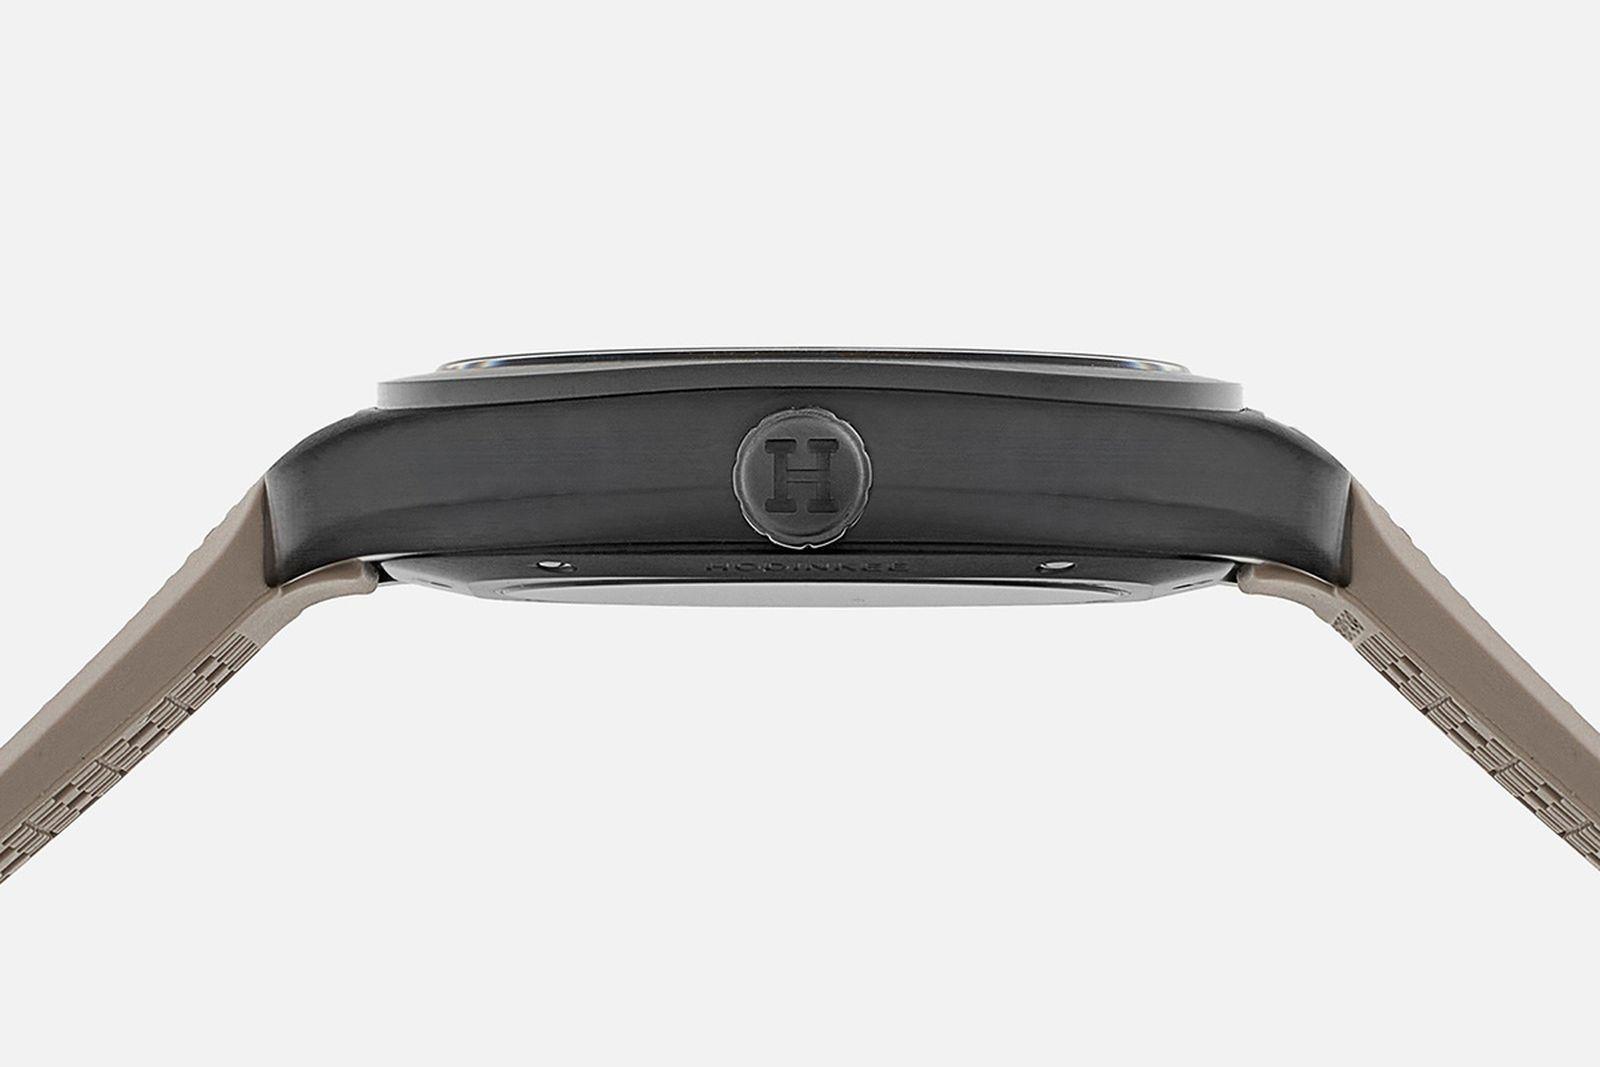 hermes-h08-hodinkee-watch (1)